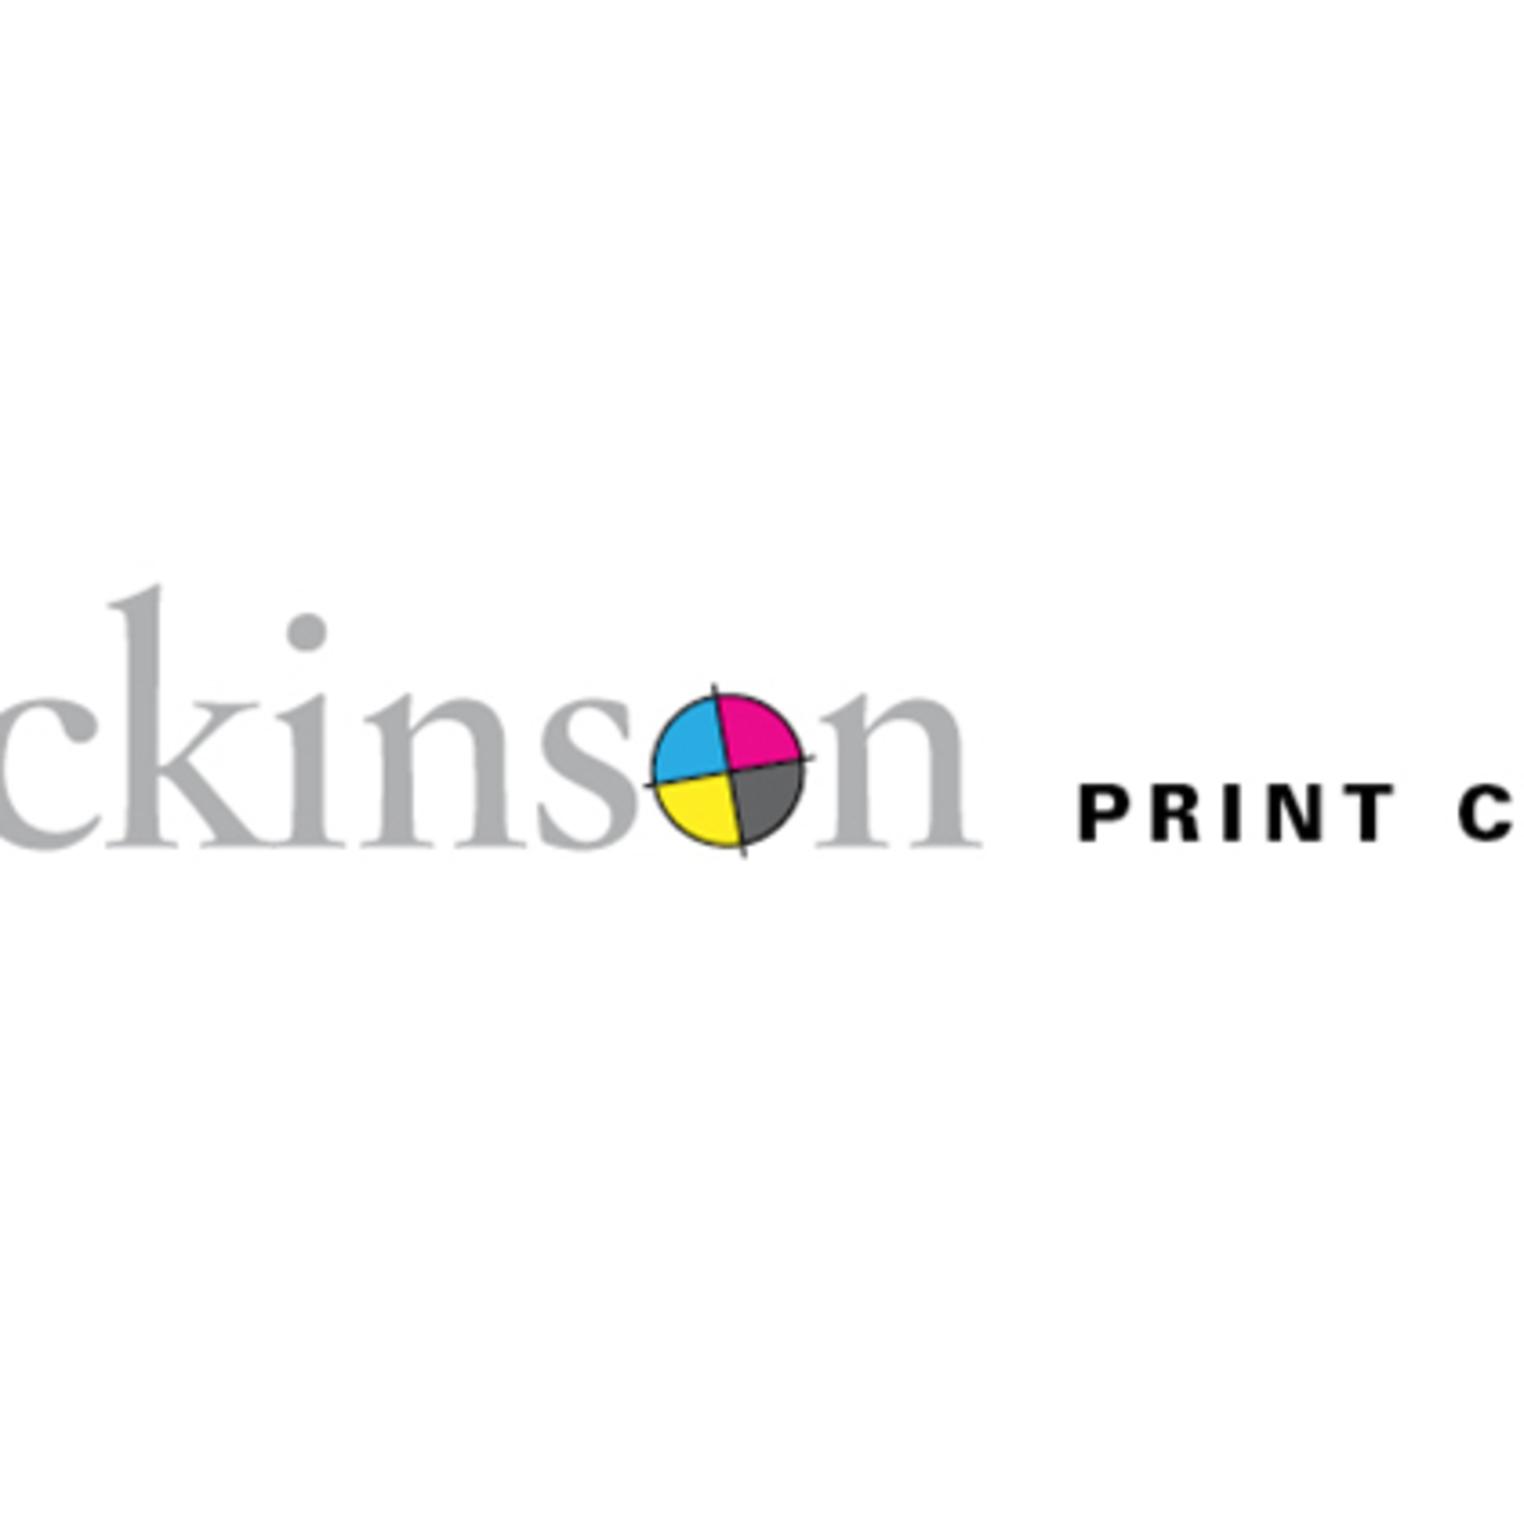 Dickinson Print Center